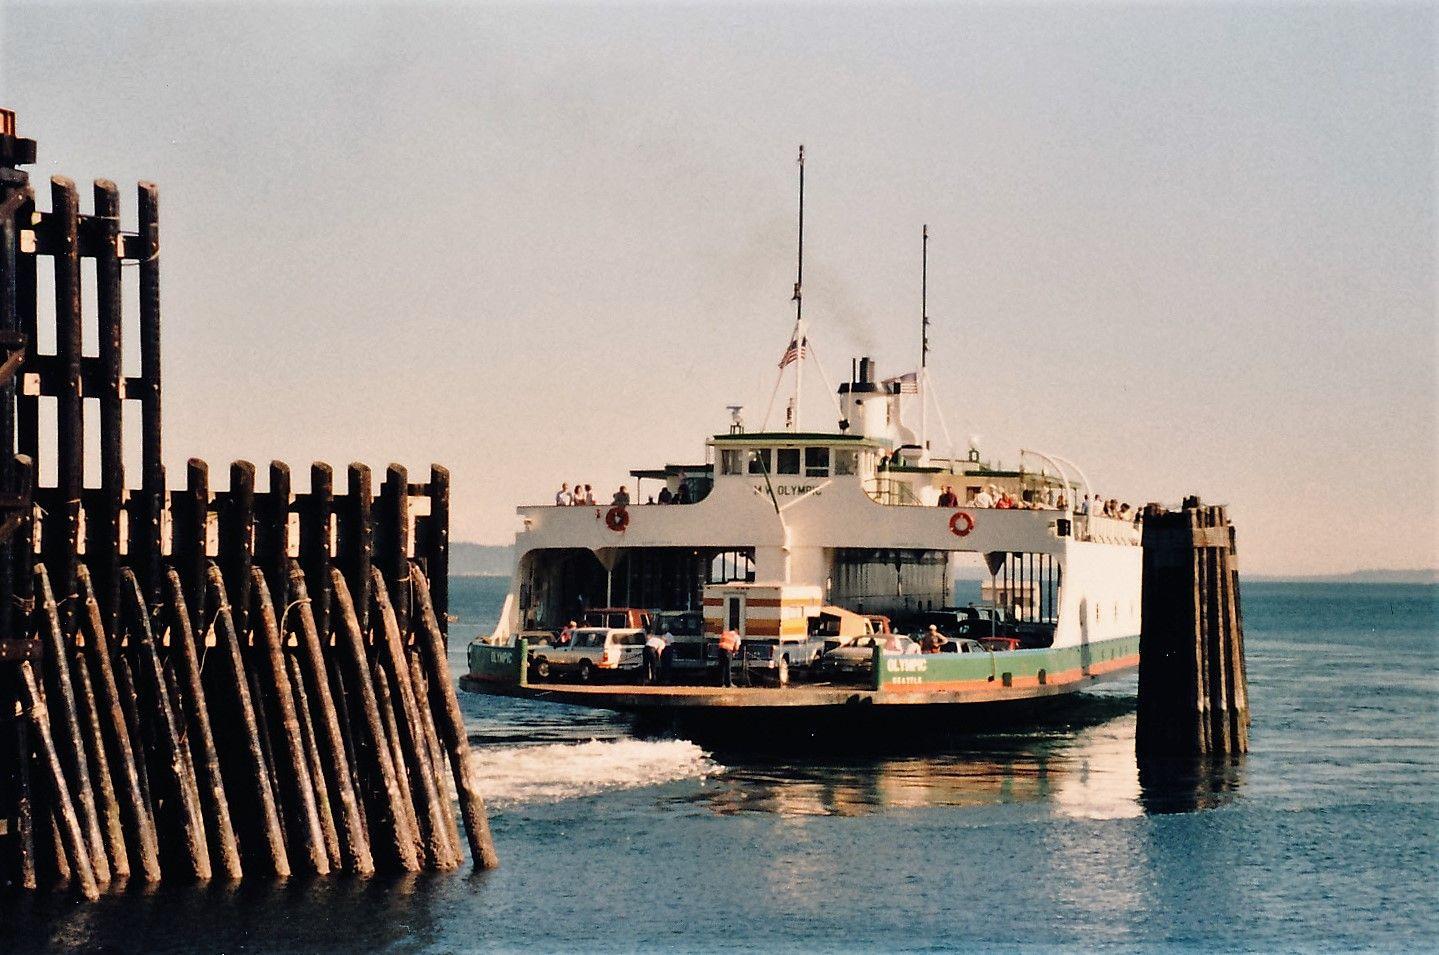 MV Olympic; Washington State Ferries